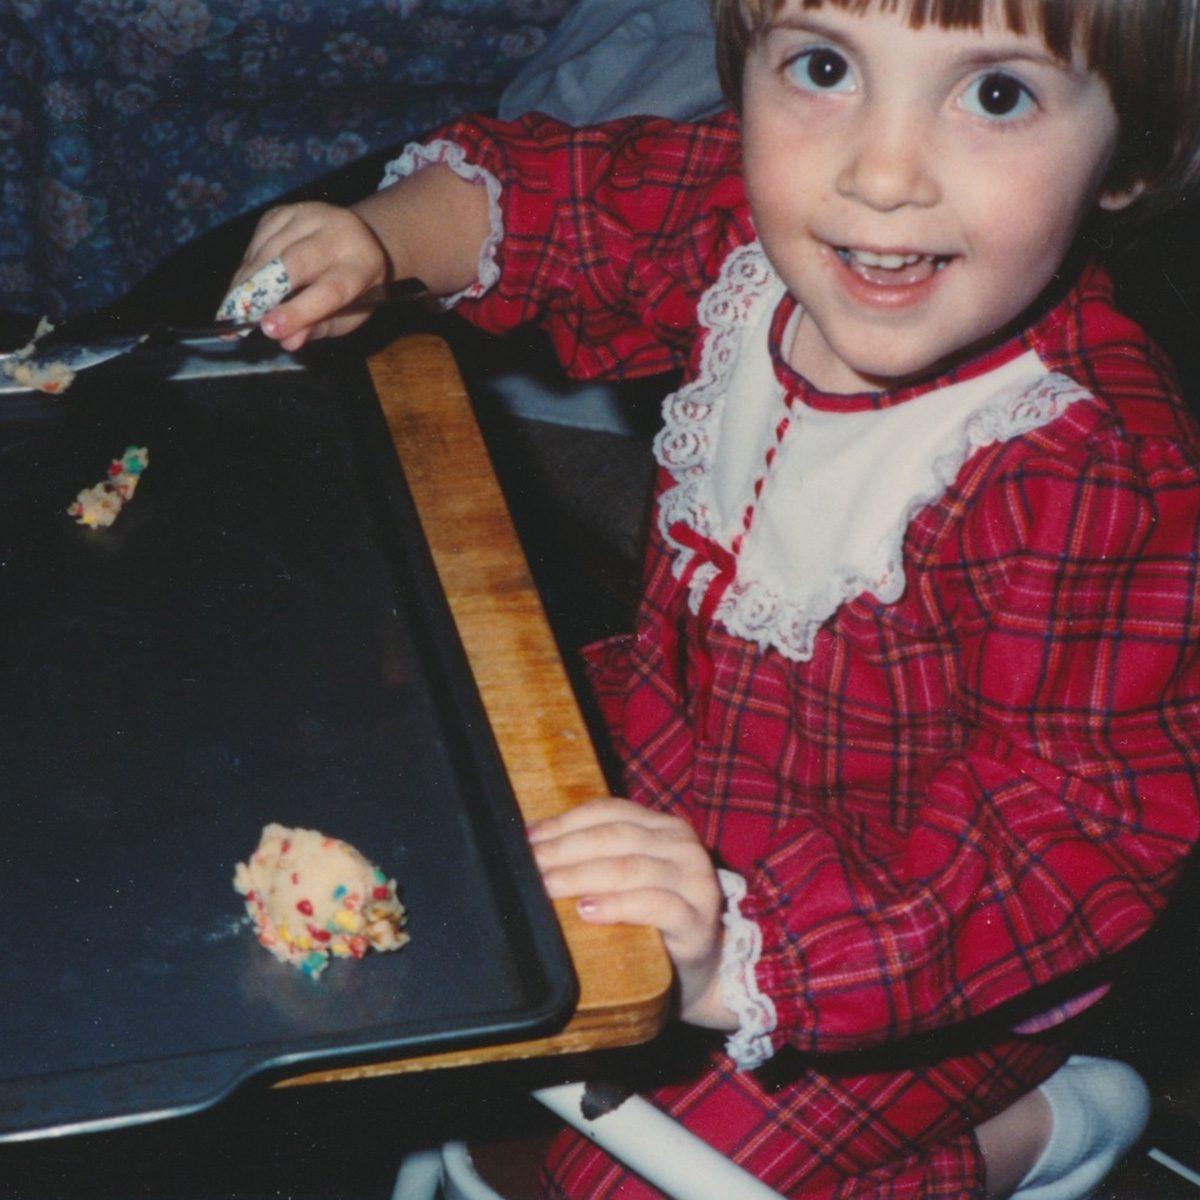 Sweet child making cookies